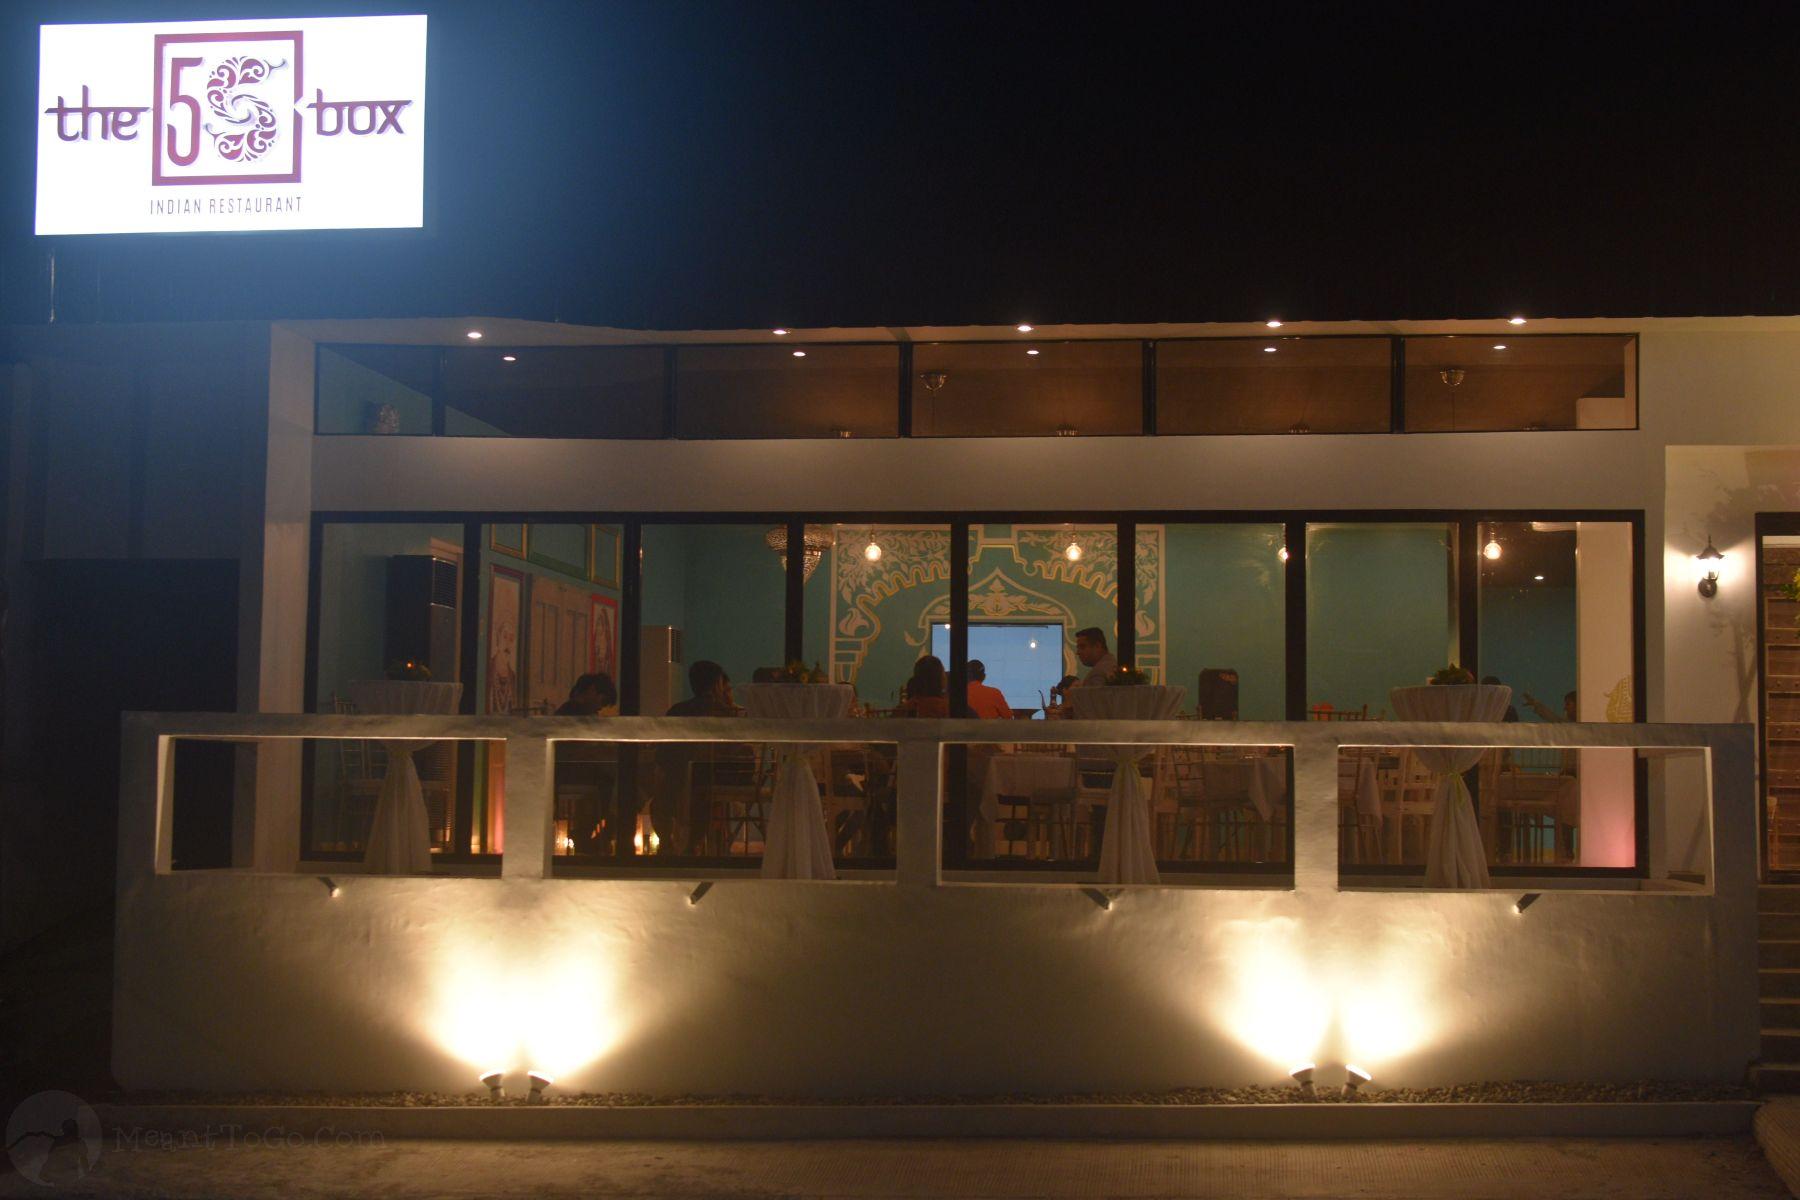 5S Box Indian Restaurant in Davao City